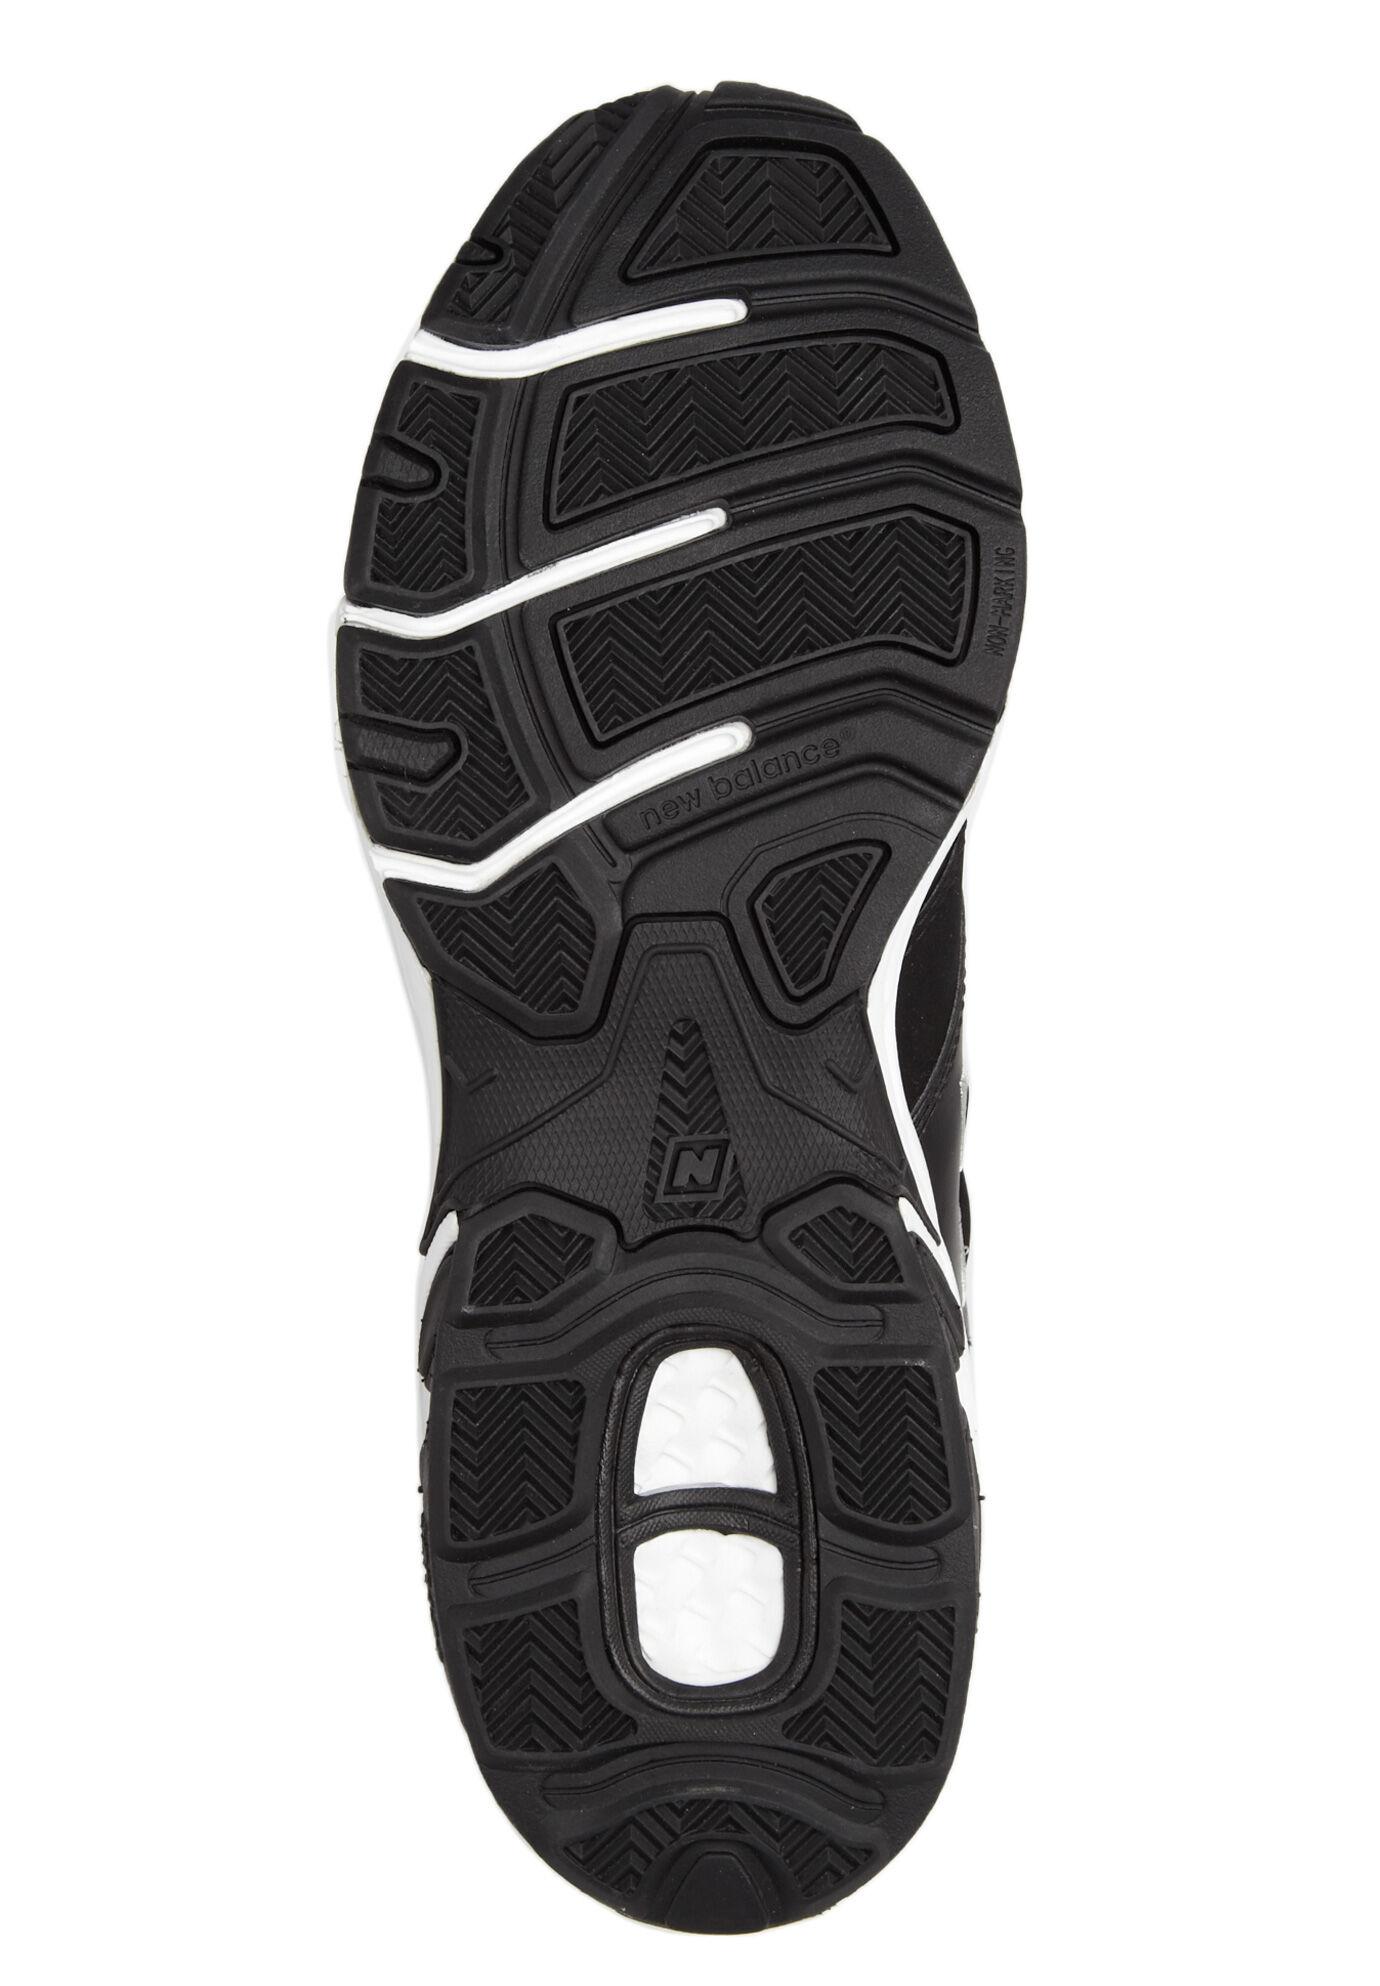 New Balance® 581 Basketball Shoes